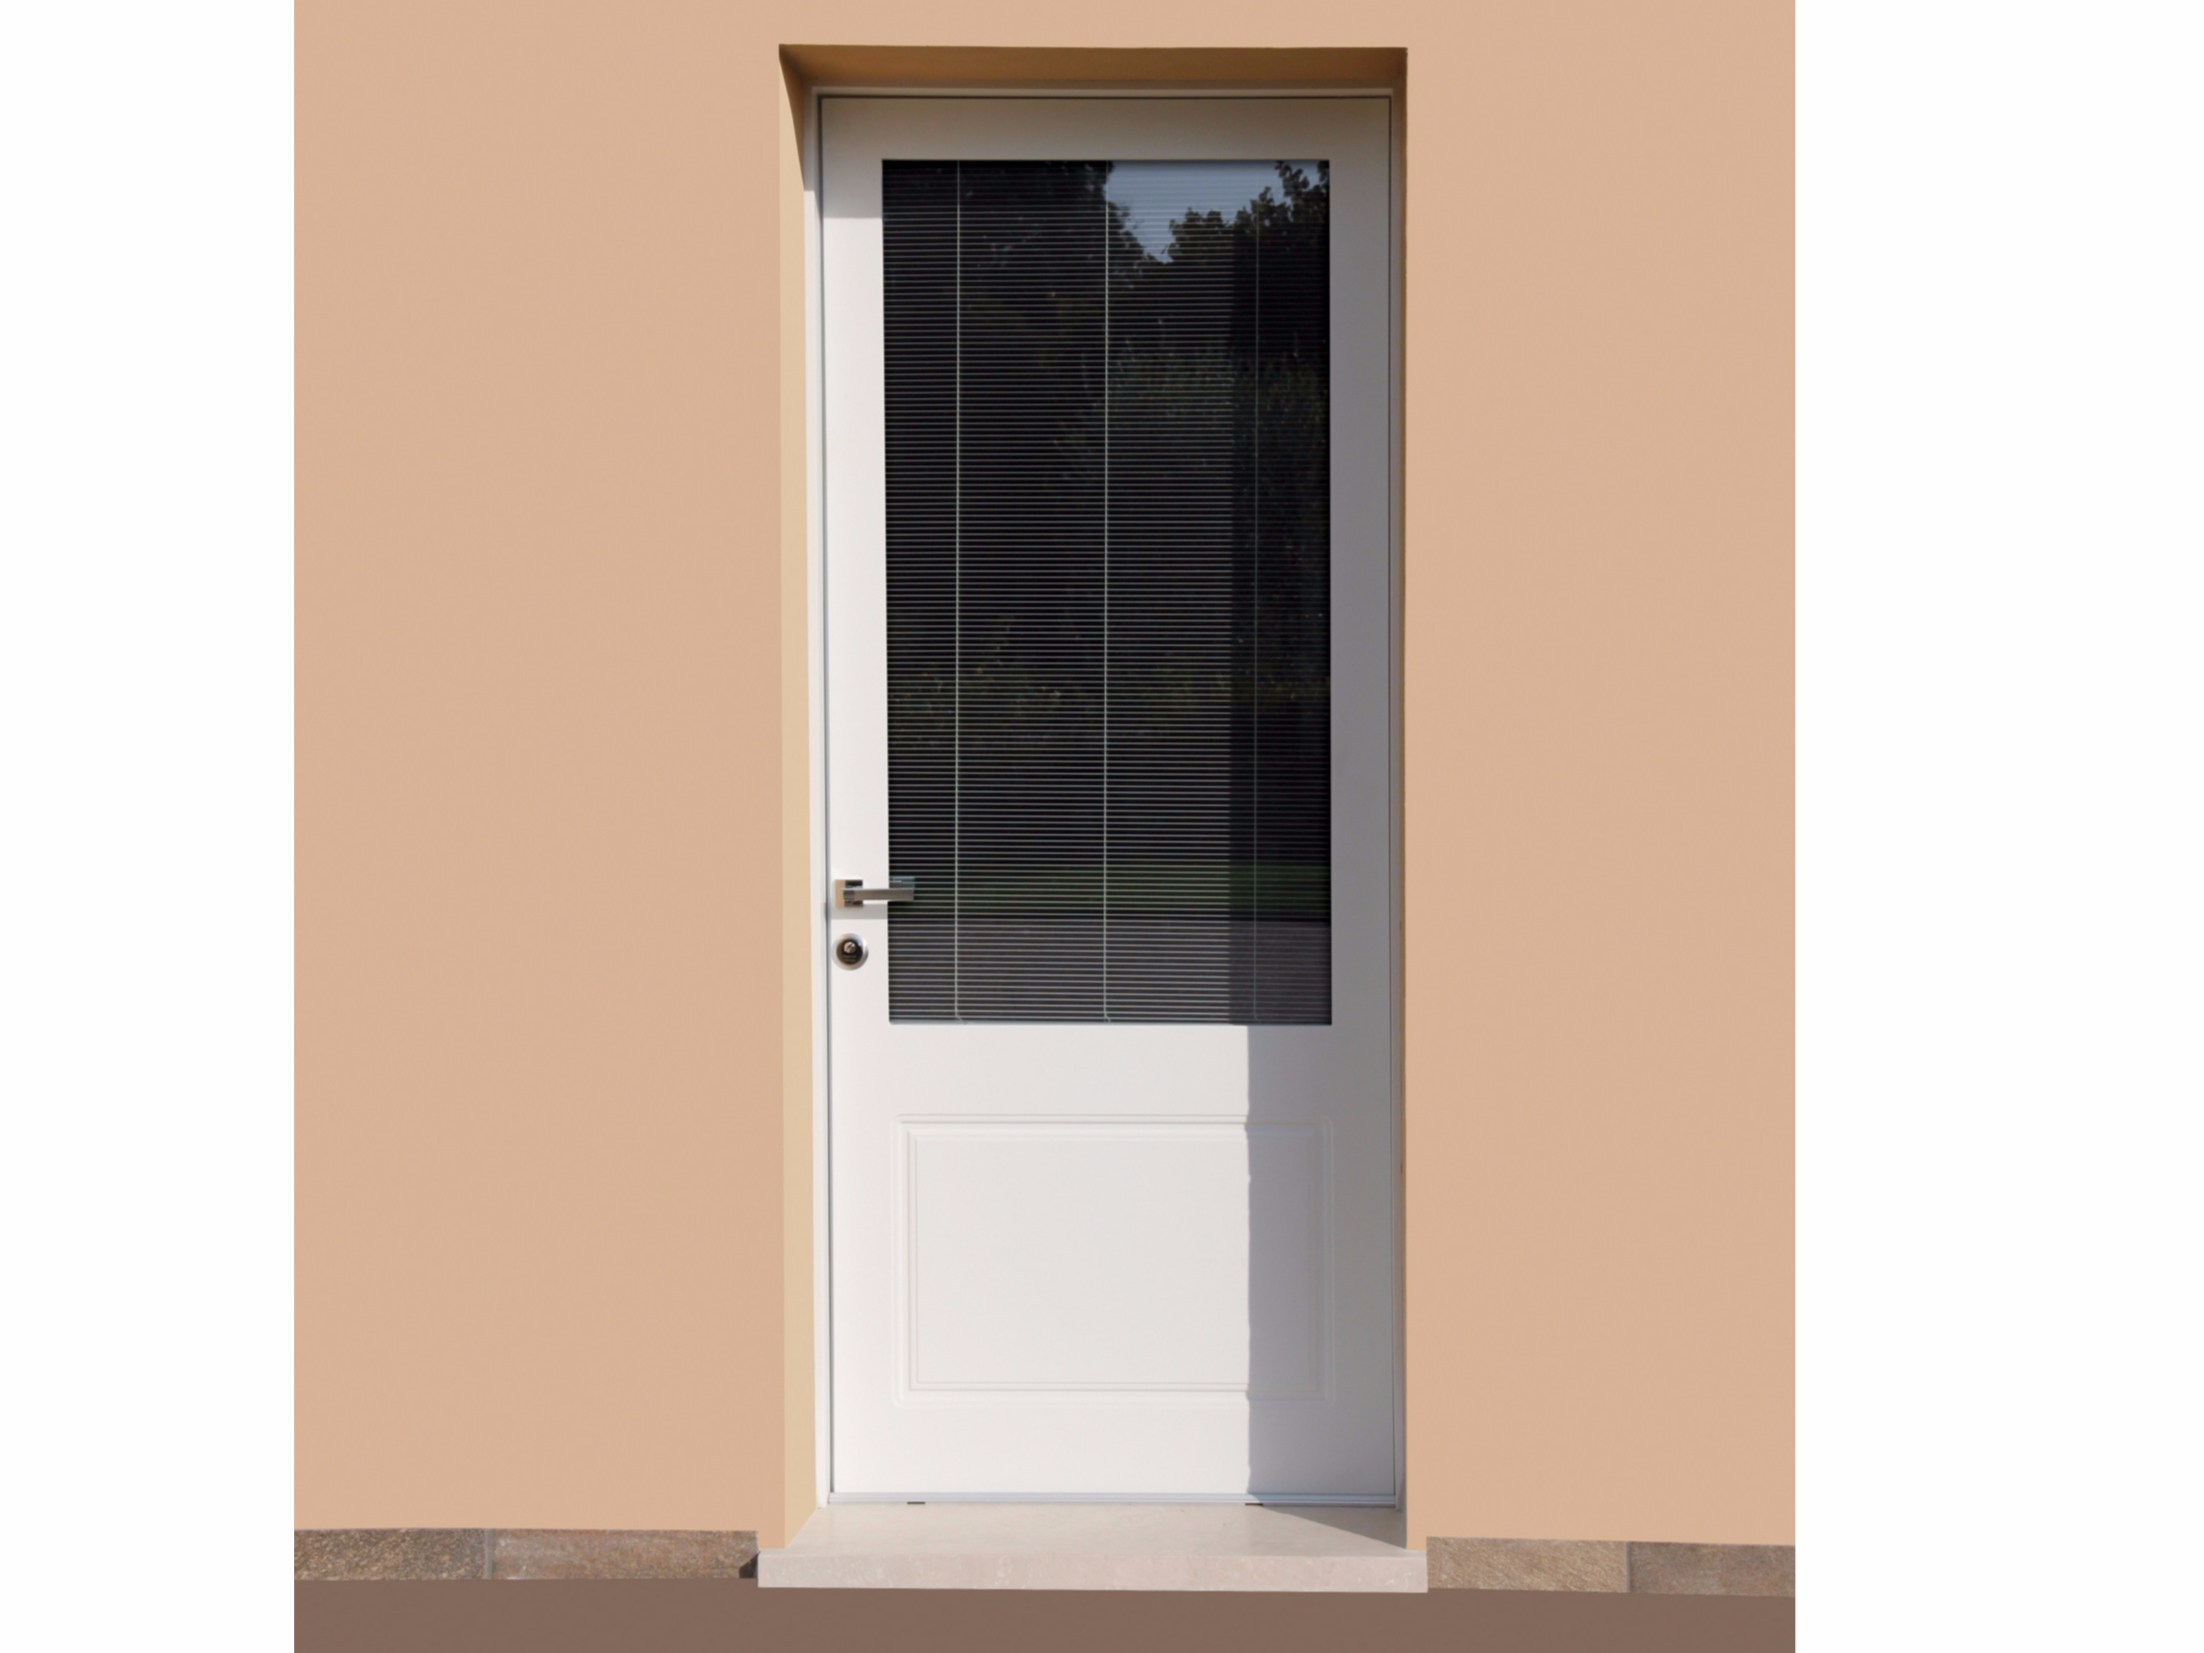 Porta d 39 ingresso acustica blindata in acciaio e vetro - Maniglia porta ingresso ...